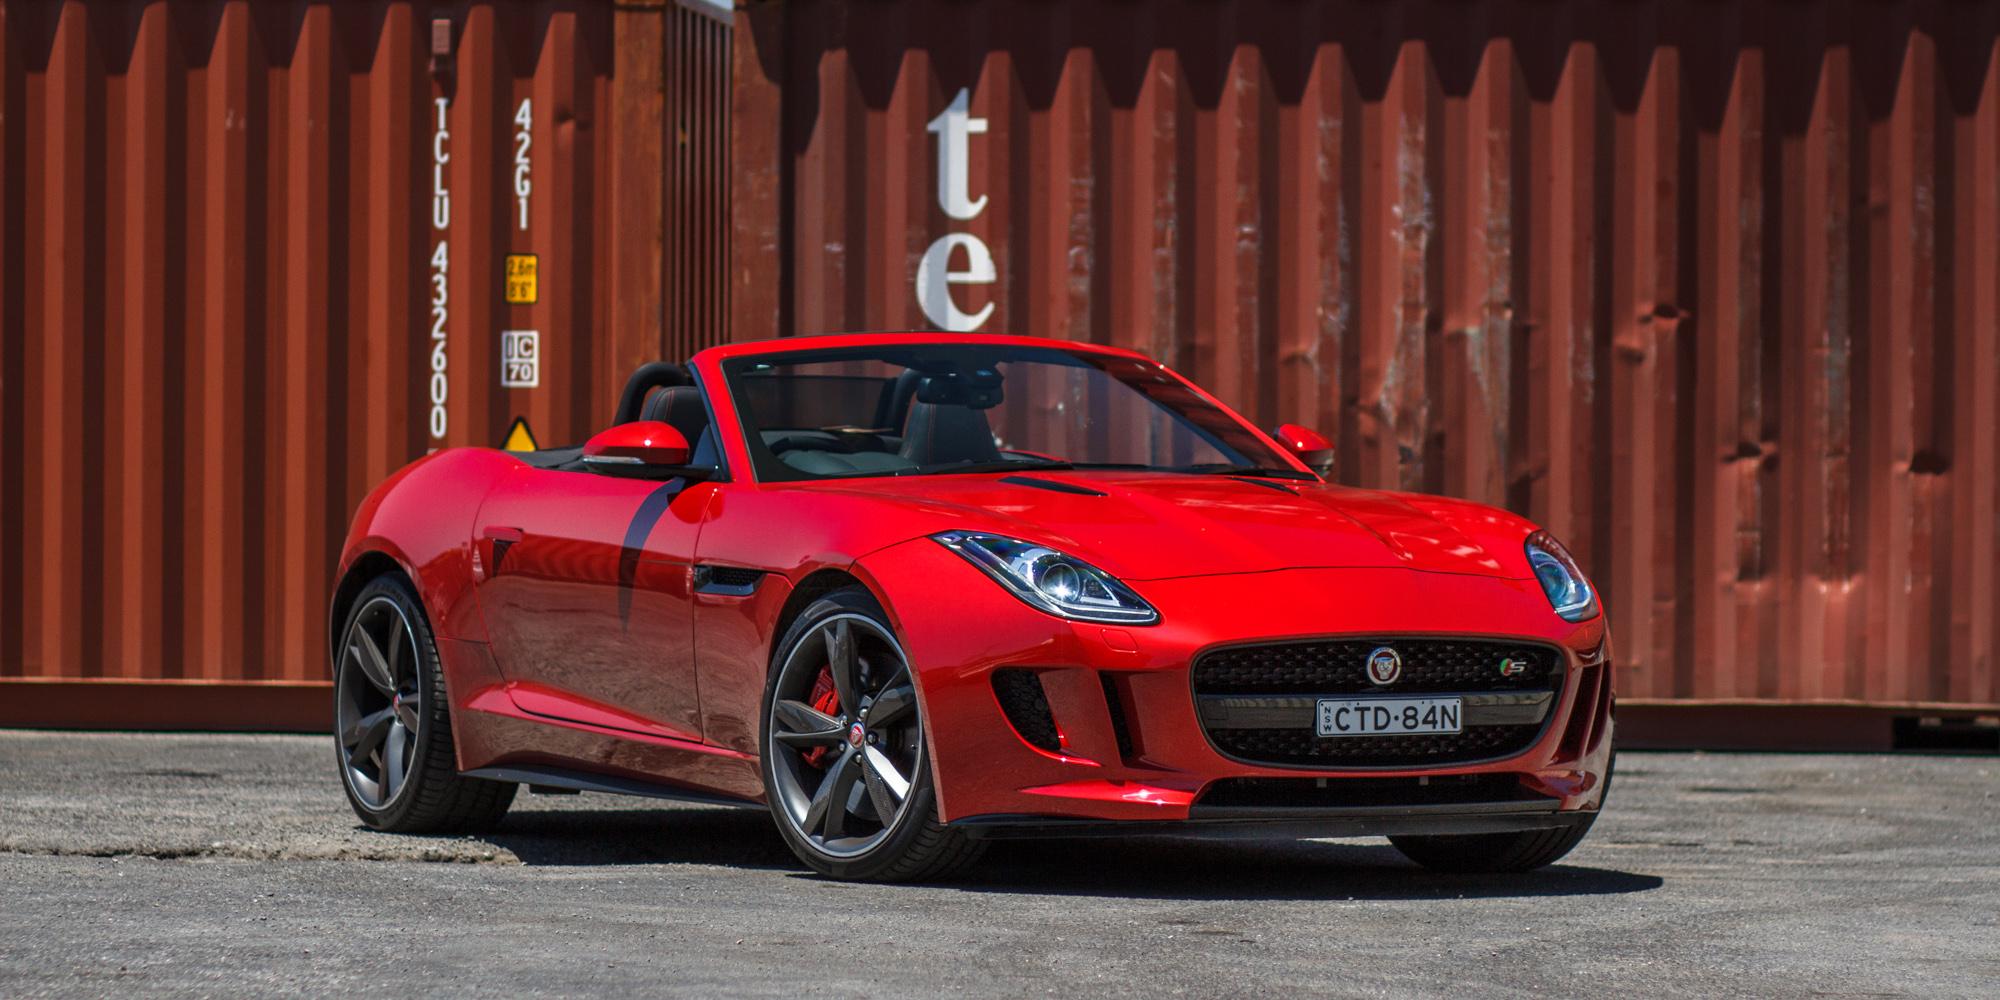 Jaguar FType V S Review CarAdvice - 2015 jaguar f type v8 s